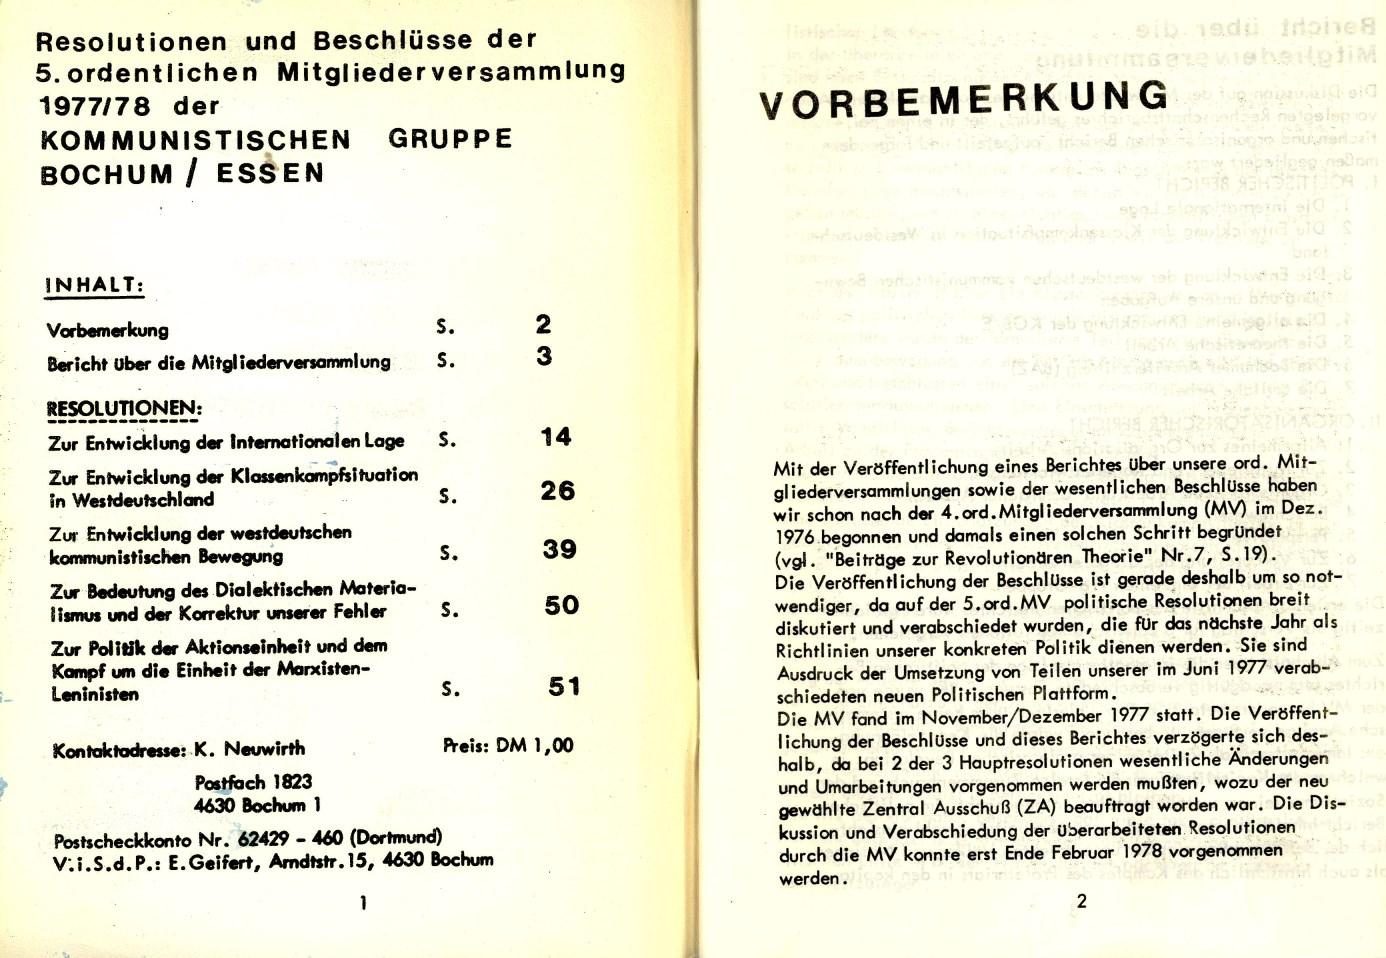 KGBE_1978_Resolutionen_02